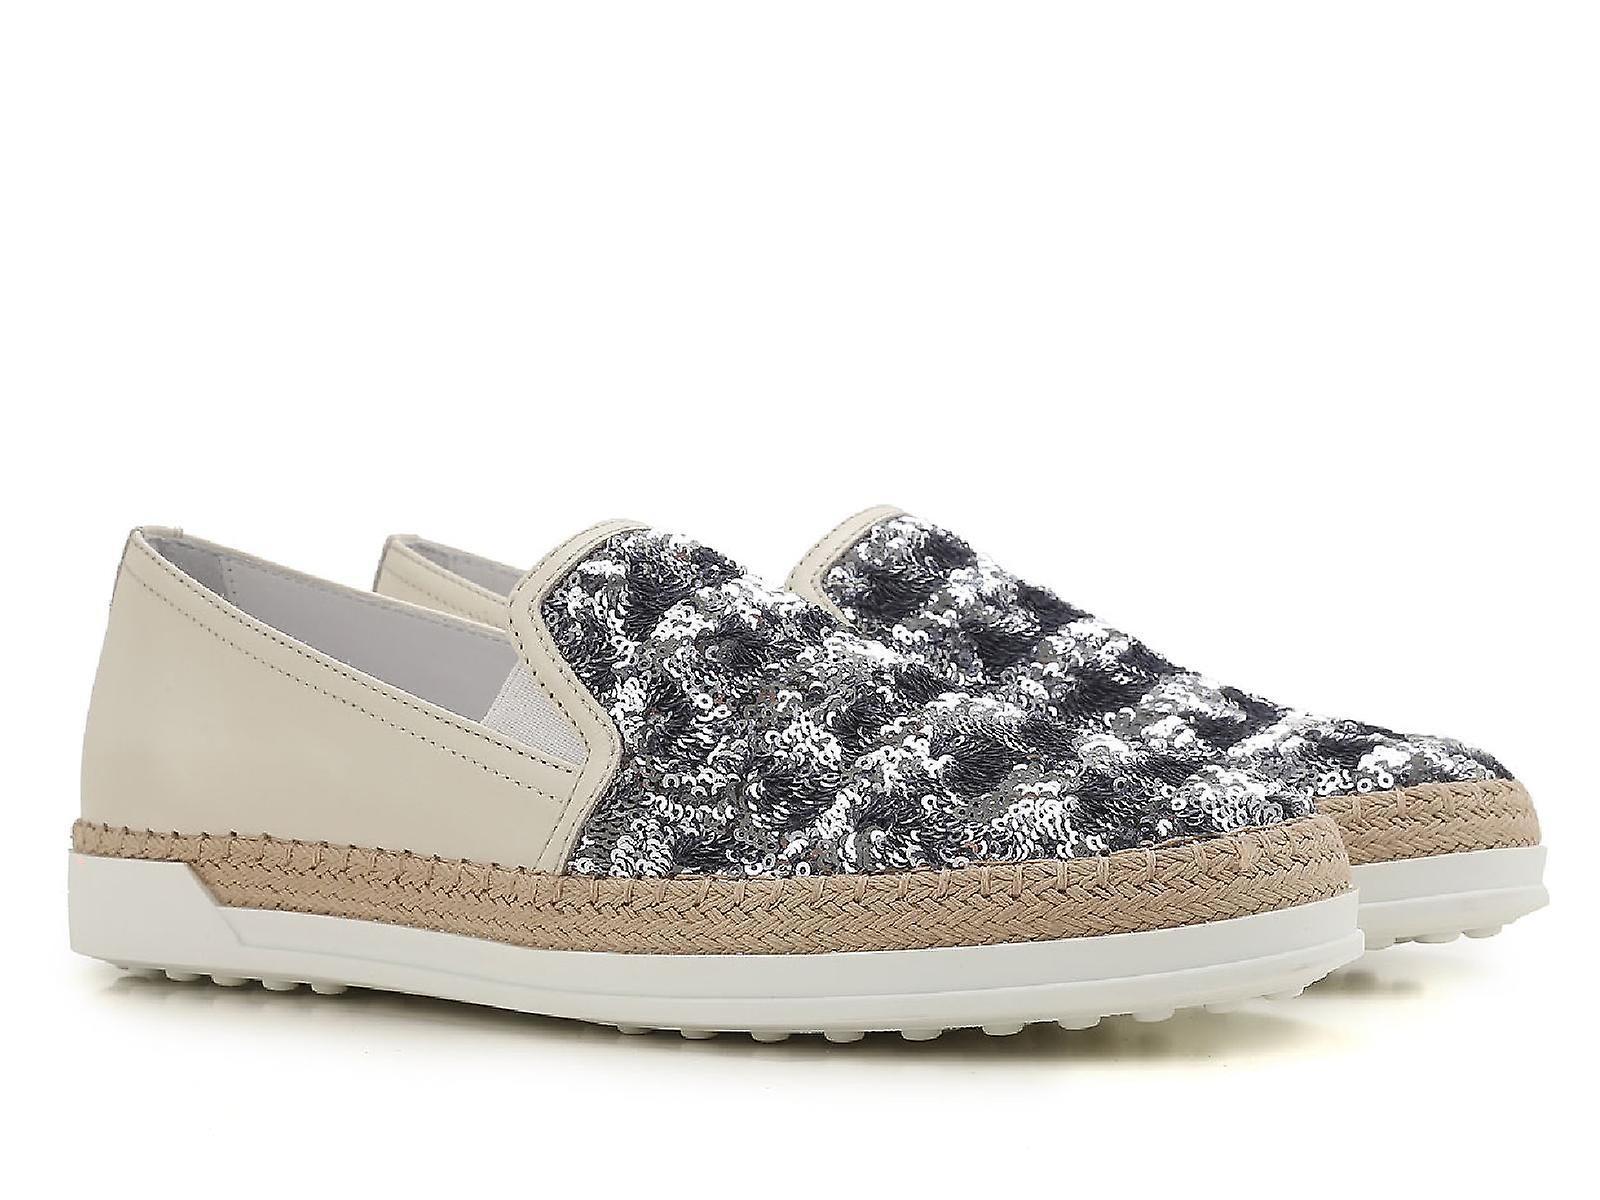 Tod's Xxw0tv0j970g450zs0 Women's Beige/blue Sequins Slip On Sneakers